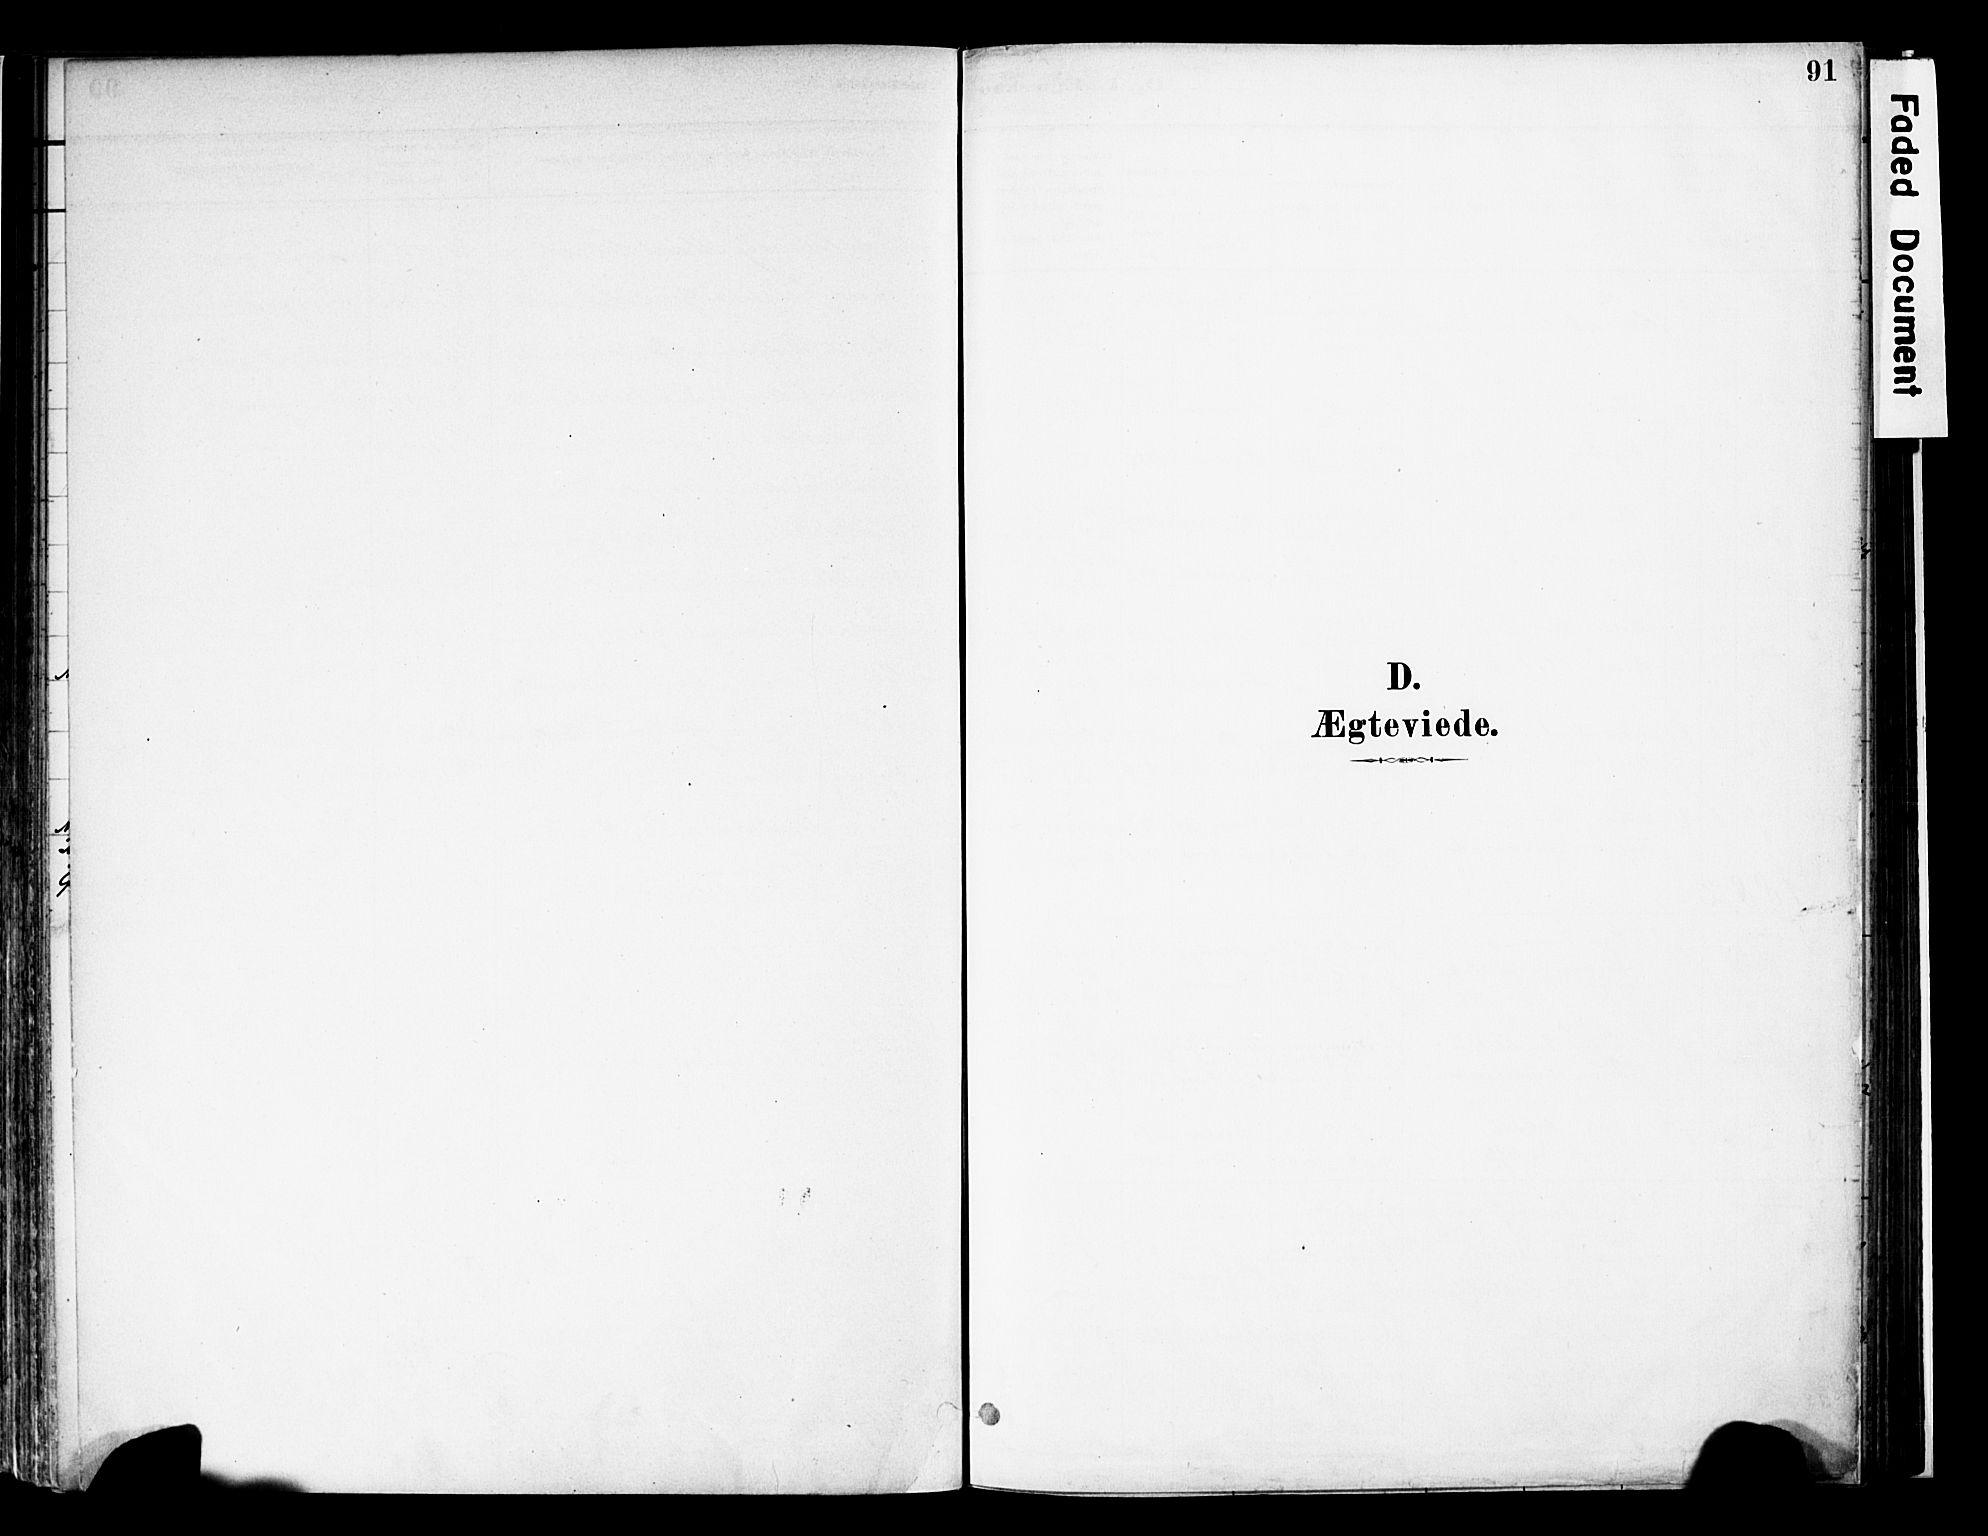 SAH, Vestre Slidre prestekontor, Ministerialbok nr. 6, 1881-1912, s. 91